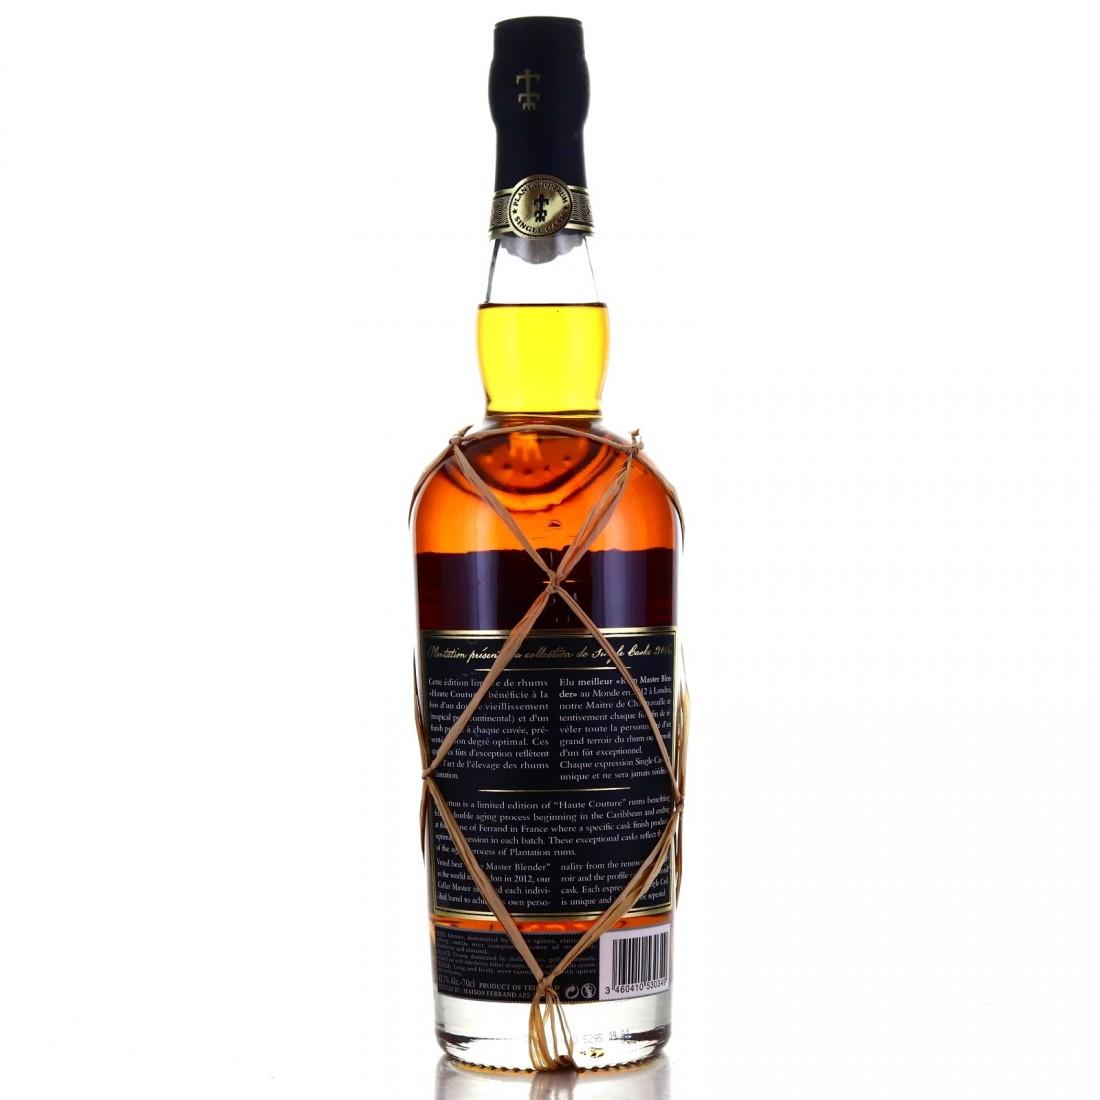 Trinidad Rum 2000 Plantation 16 Year Old Single Amburana Cask Finish #5